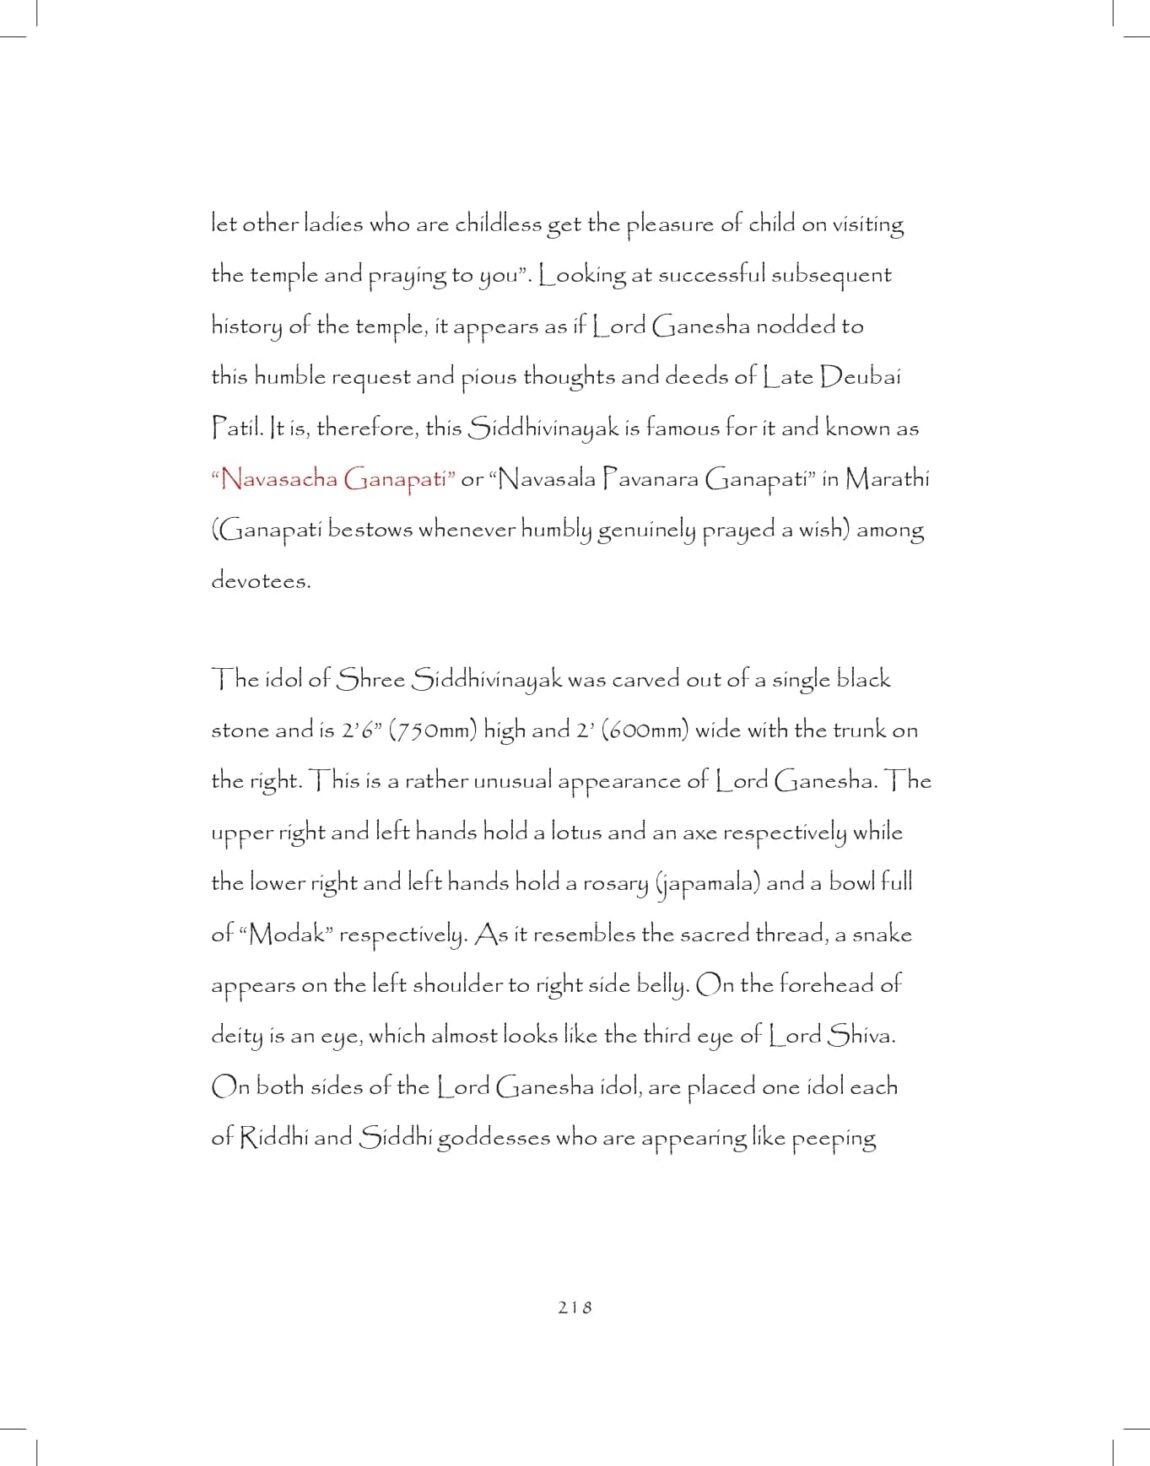 Ganesh-print_pages-to-jpg-0218.jpg